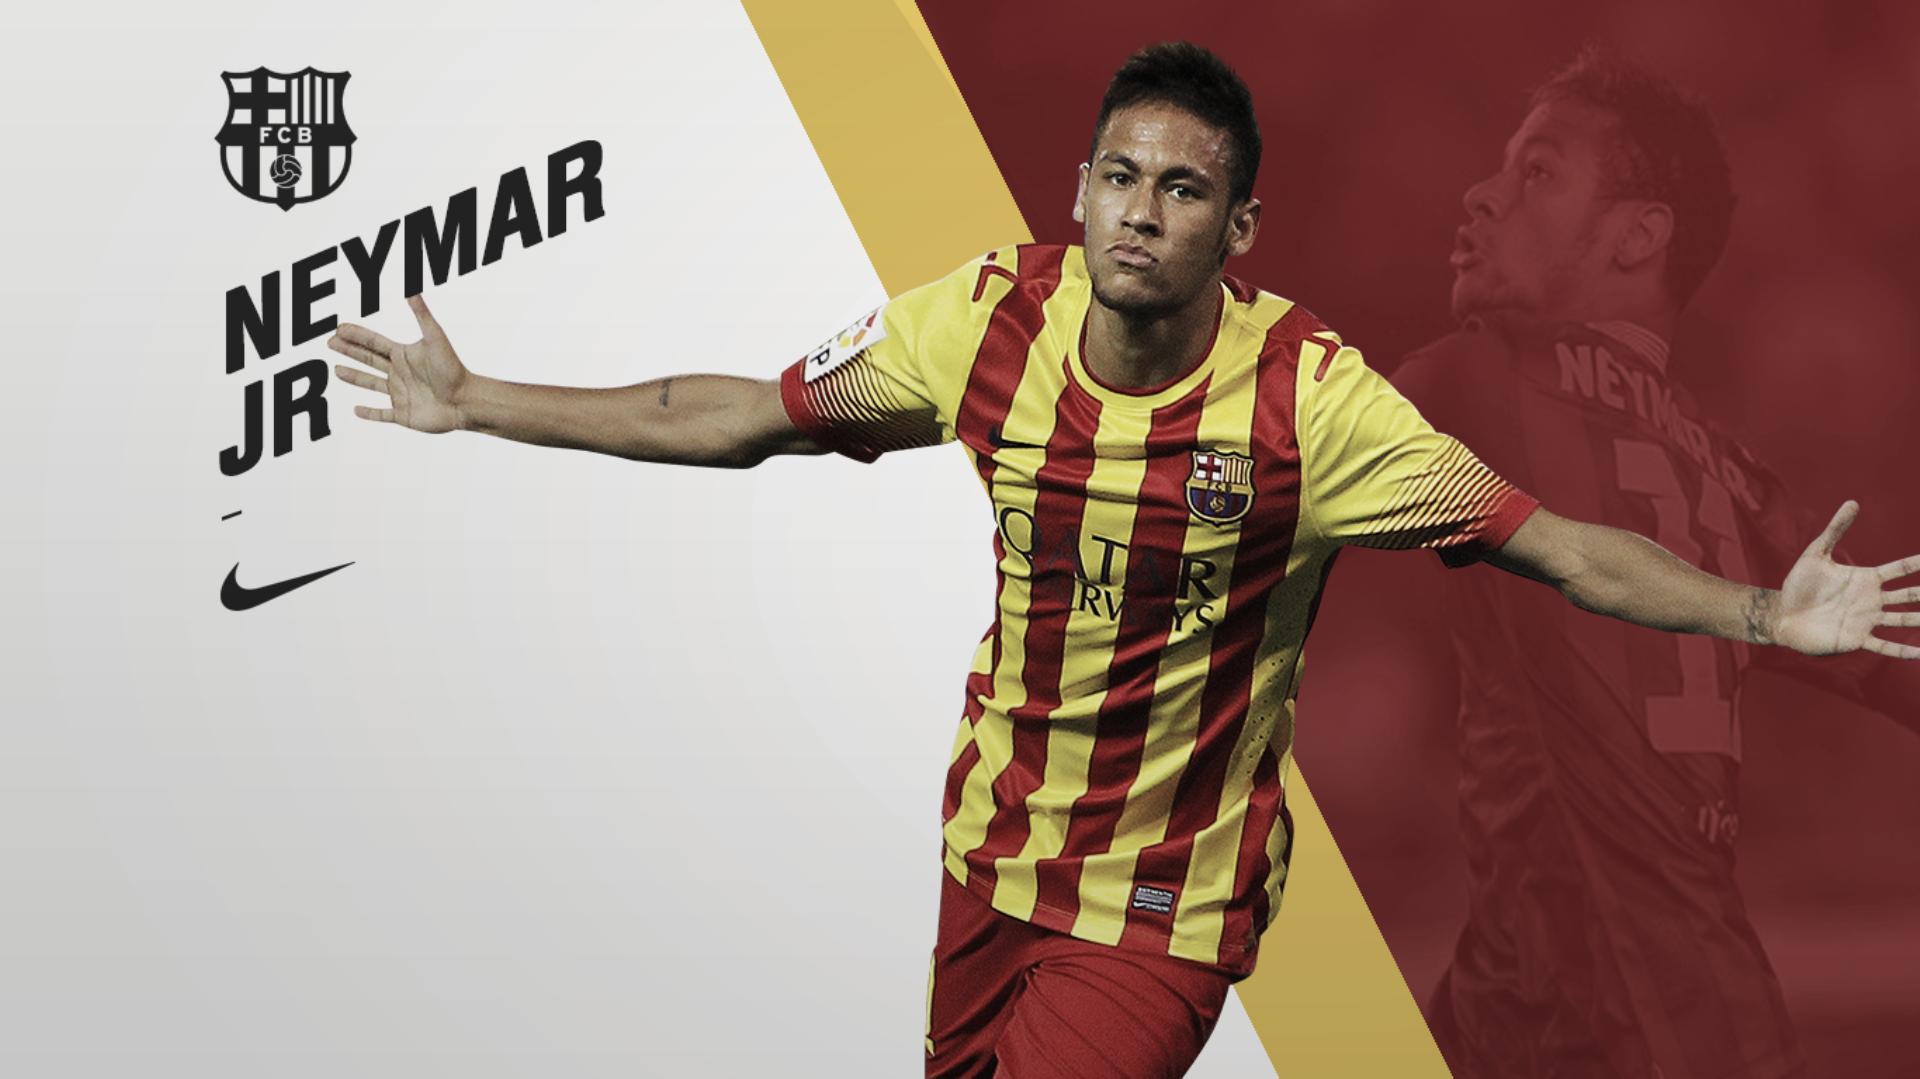 Hd wallpaper neymar - Neymar Jr Wallpapers 2015 Wallpaper Cave